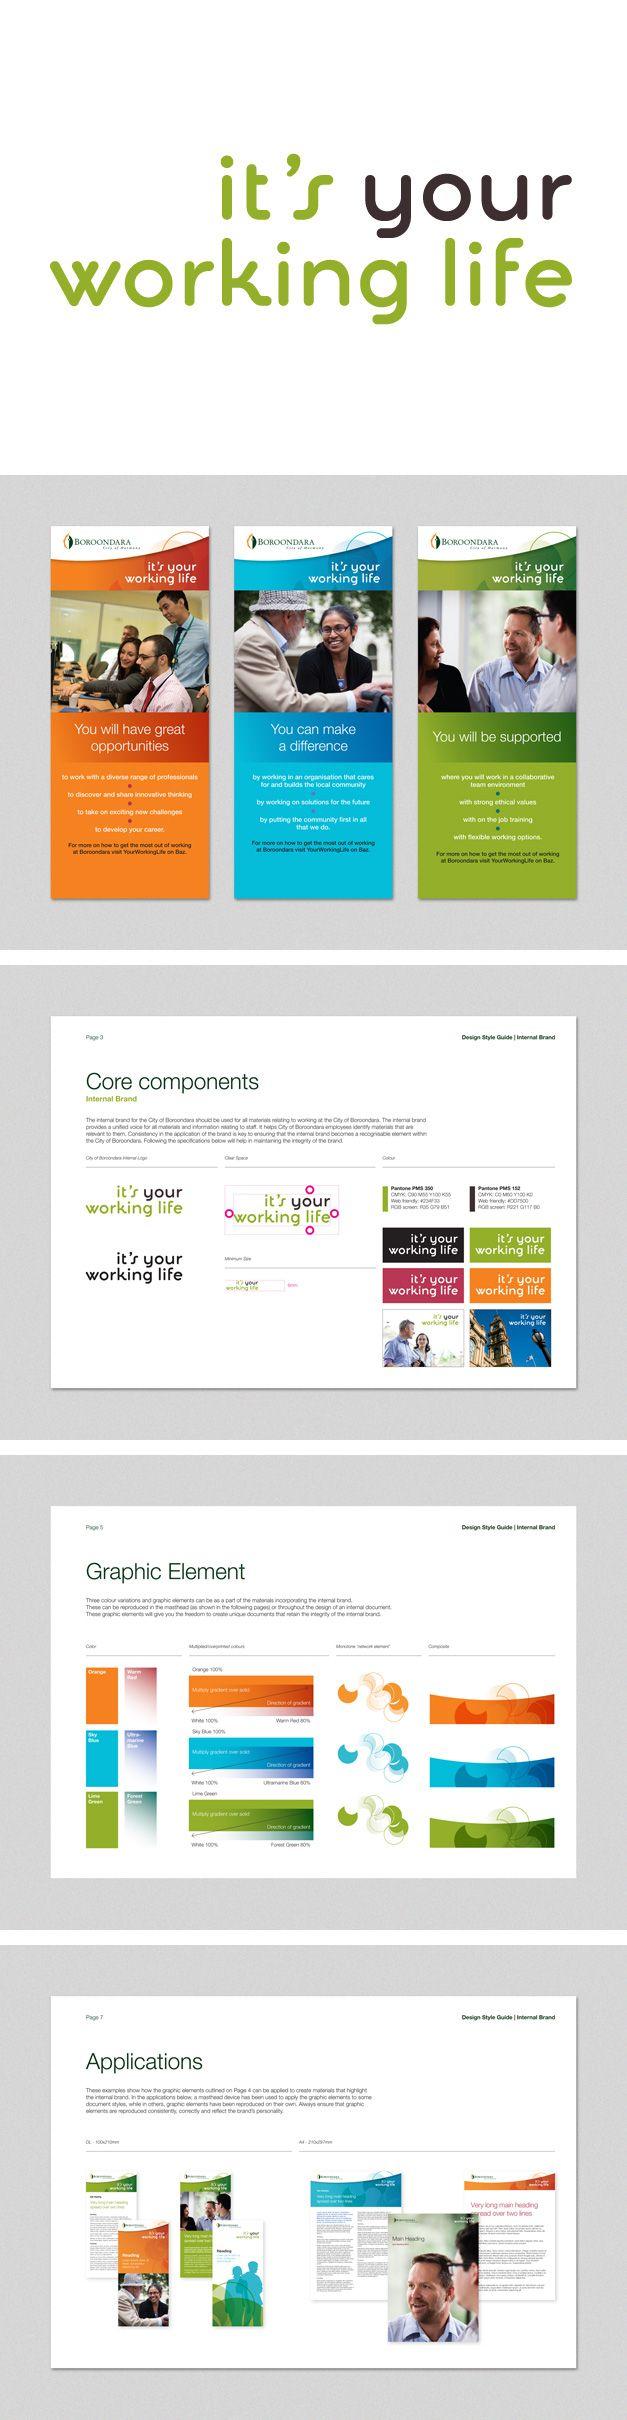 Internal branding for City of Boroondara. www.fenton.com.au #communication #PR #branding #graphicdesign